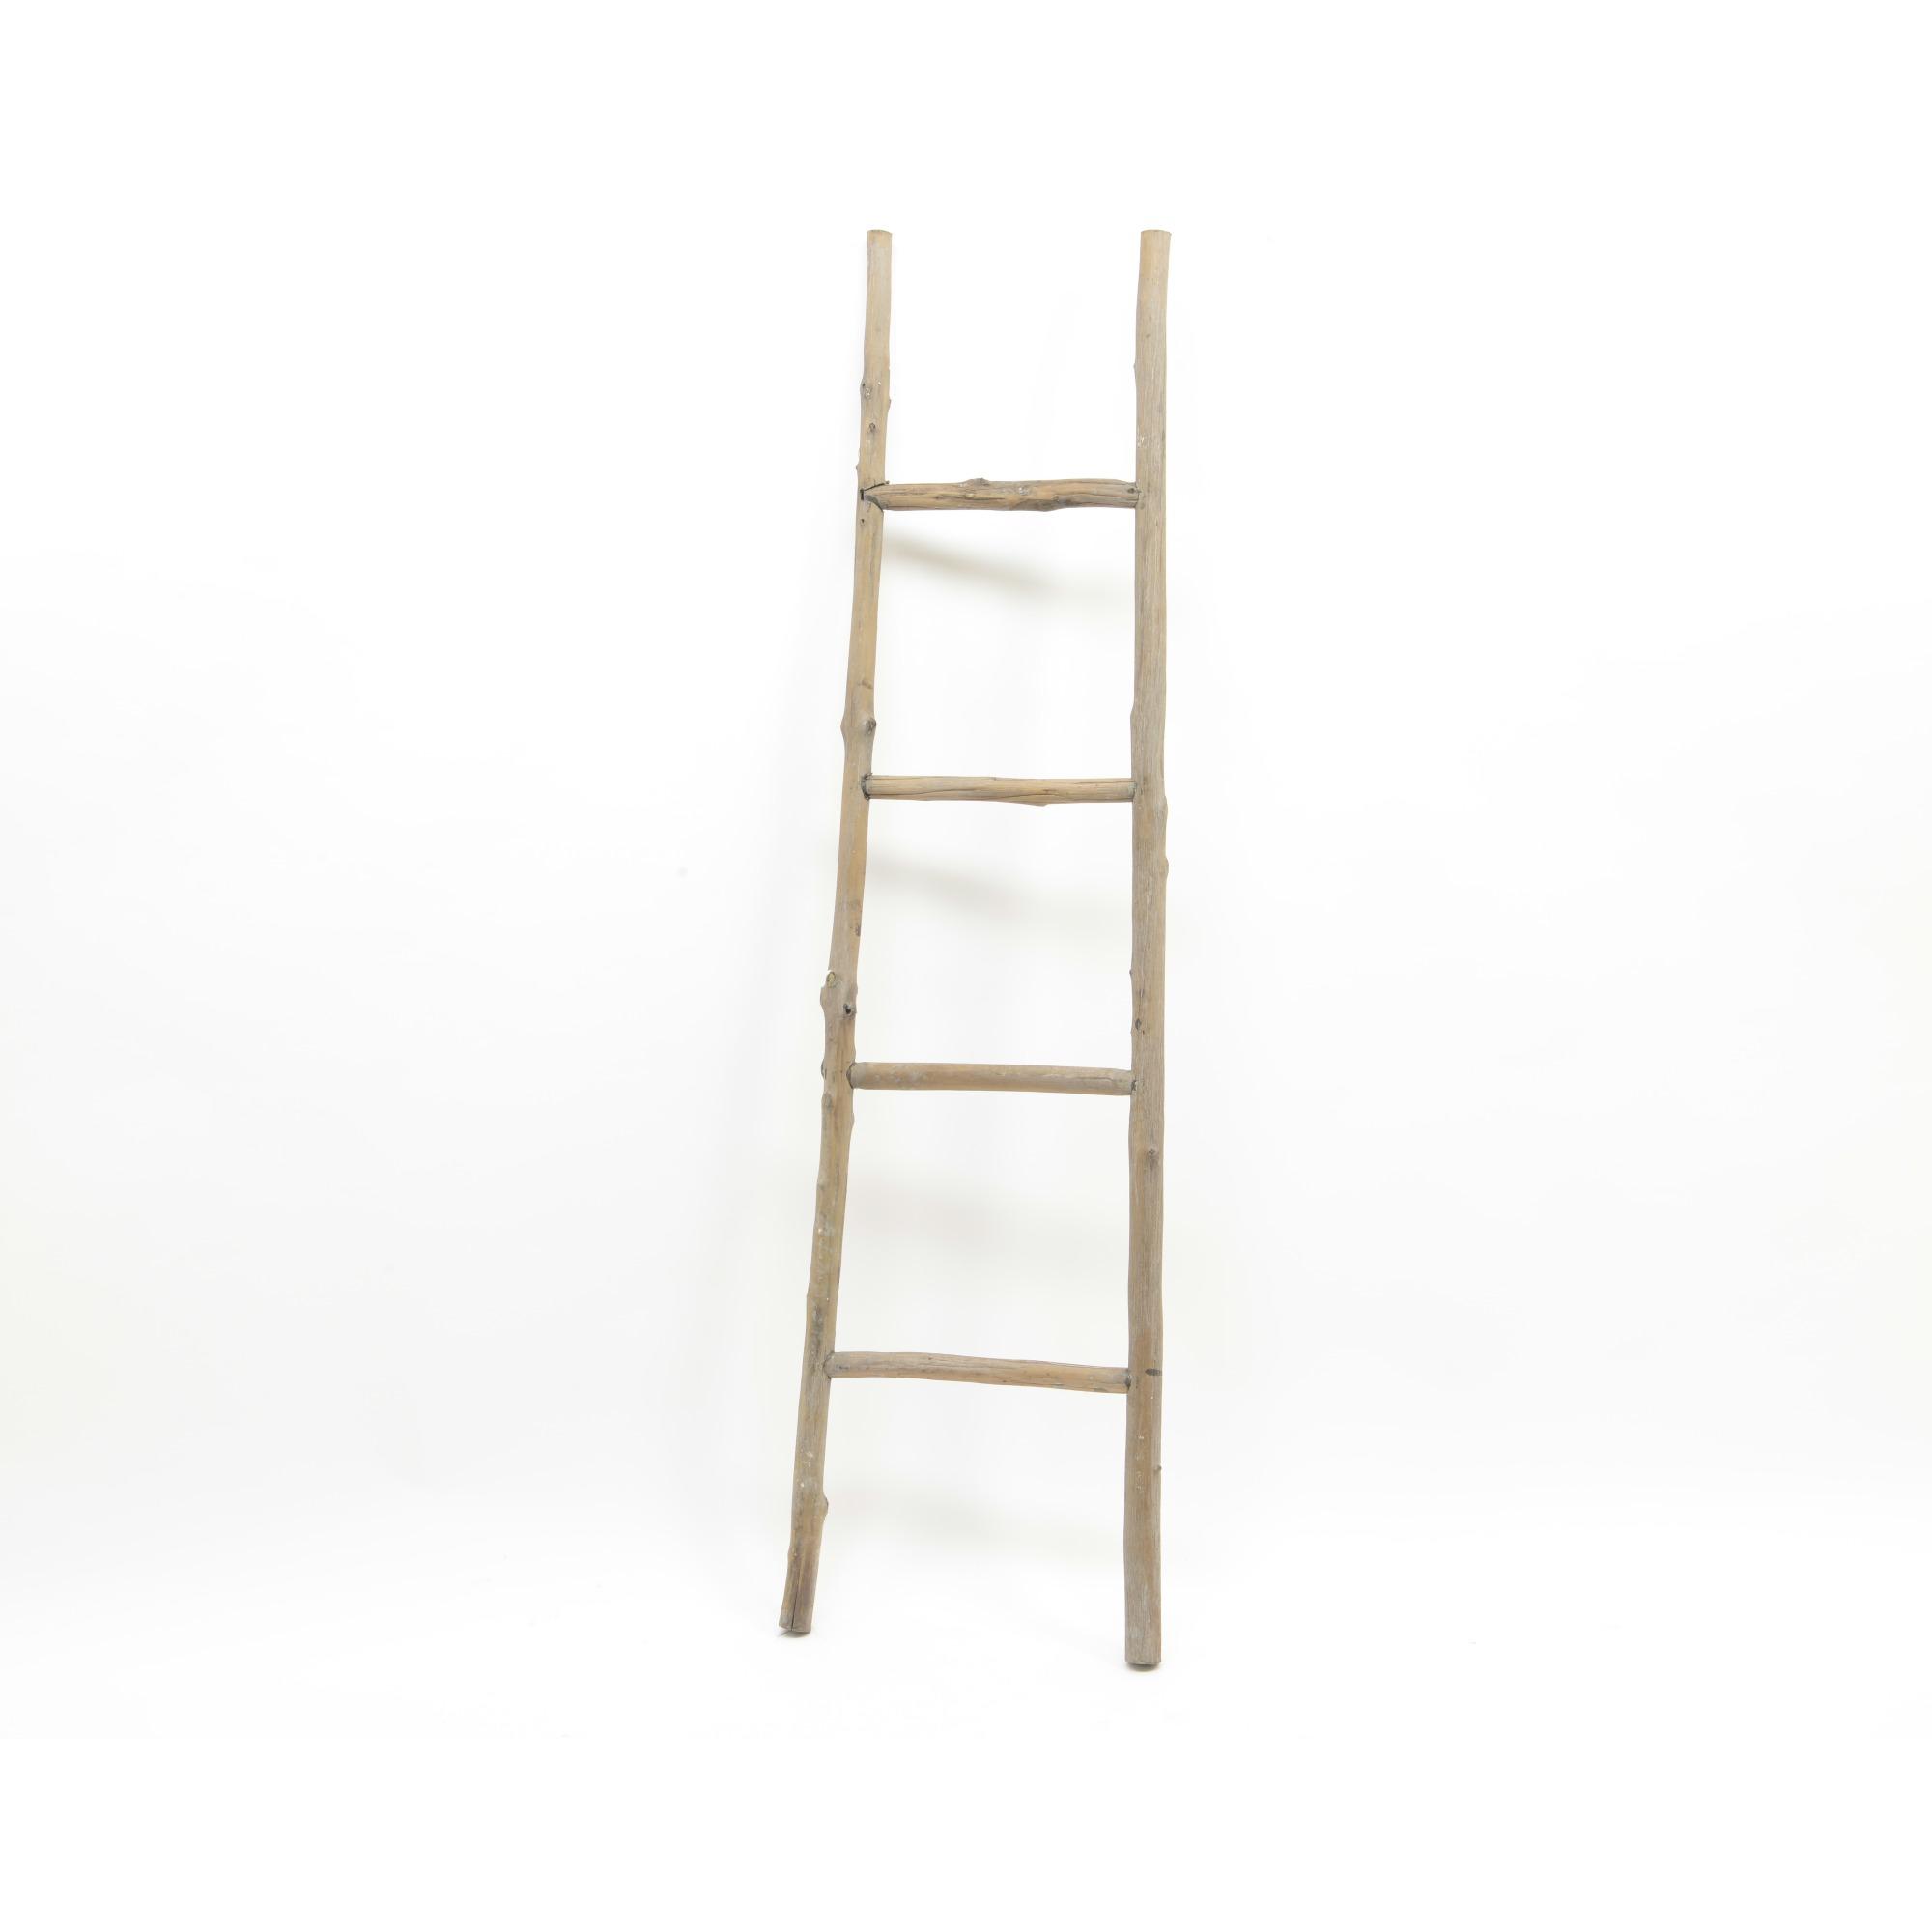 Ladder decoratief van hout overige woonaccessoires woonaccessoires meubelen gamma - Decoratie houten trap ...